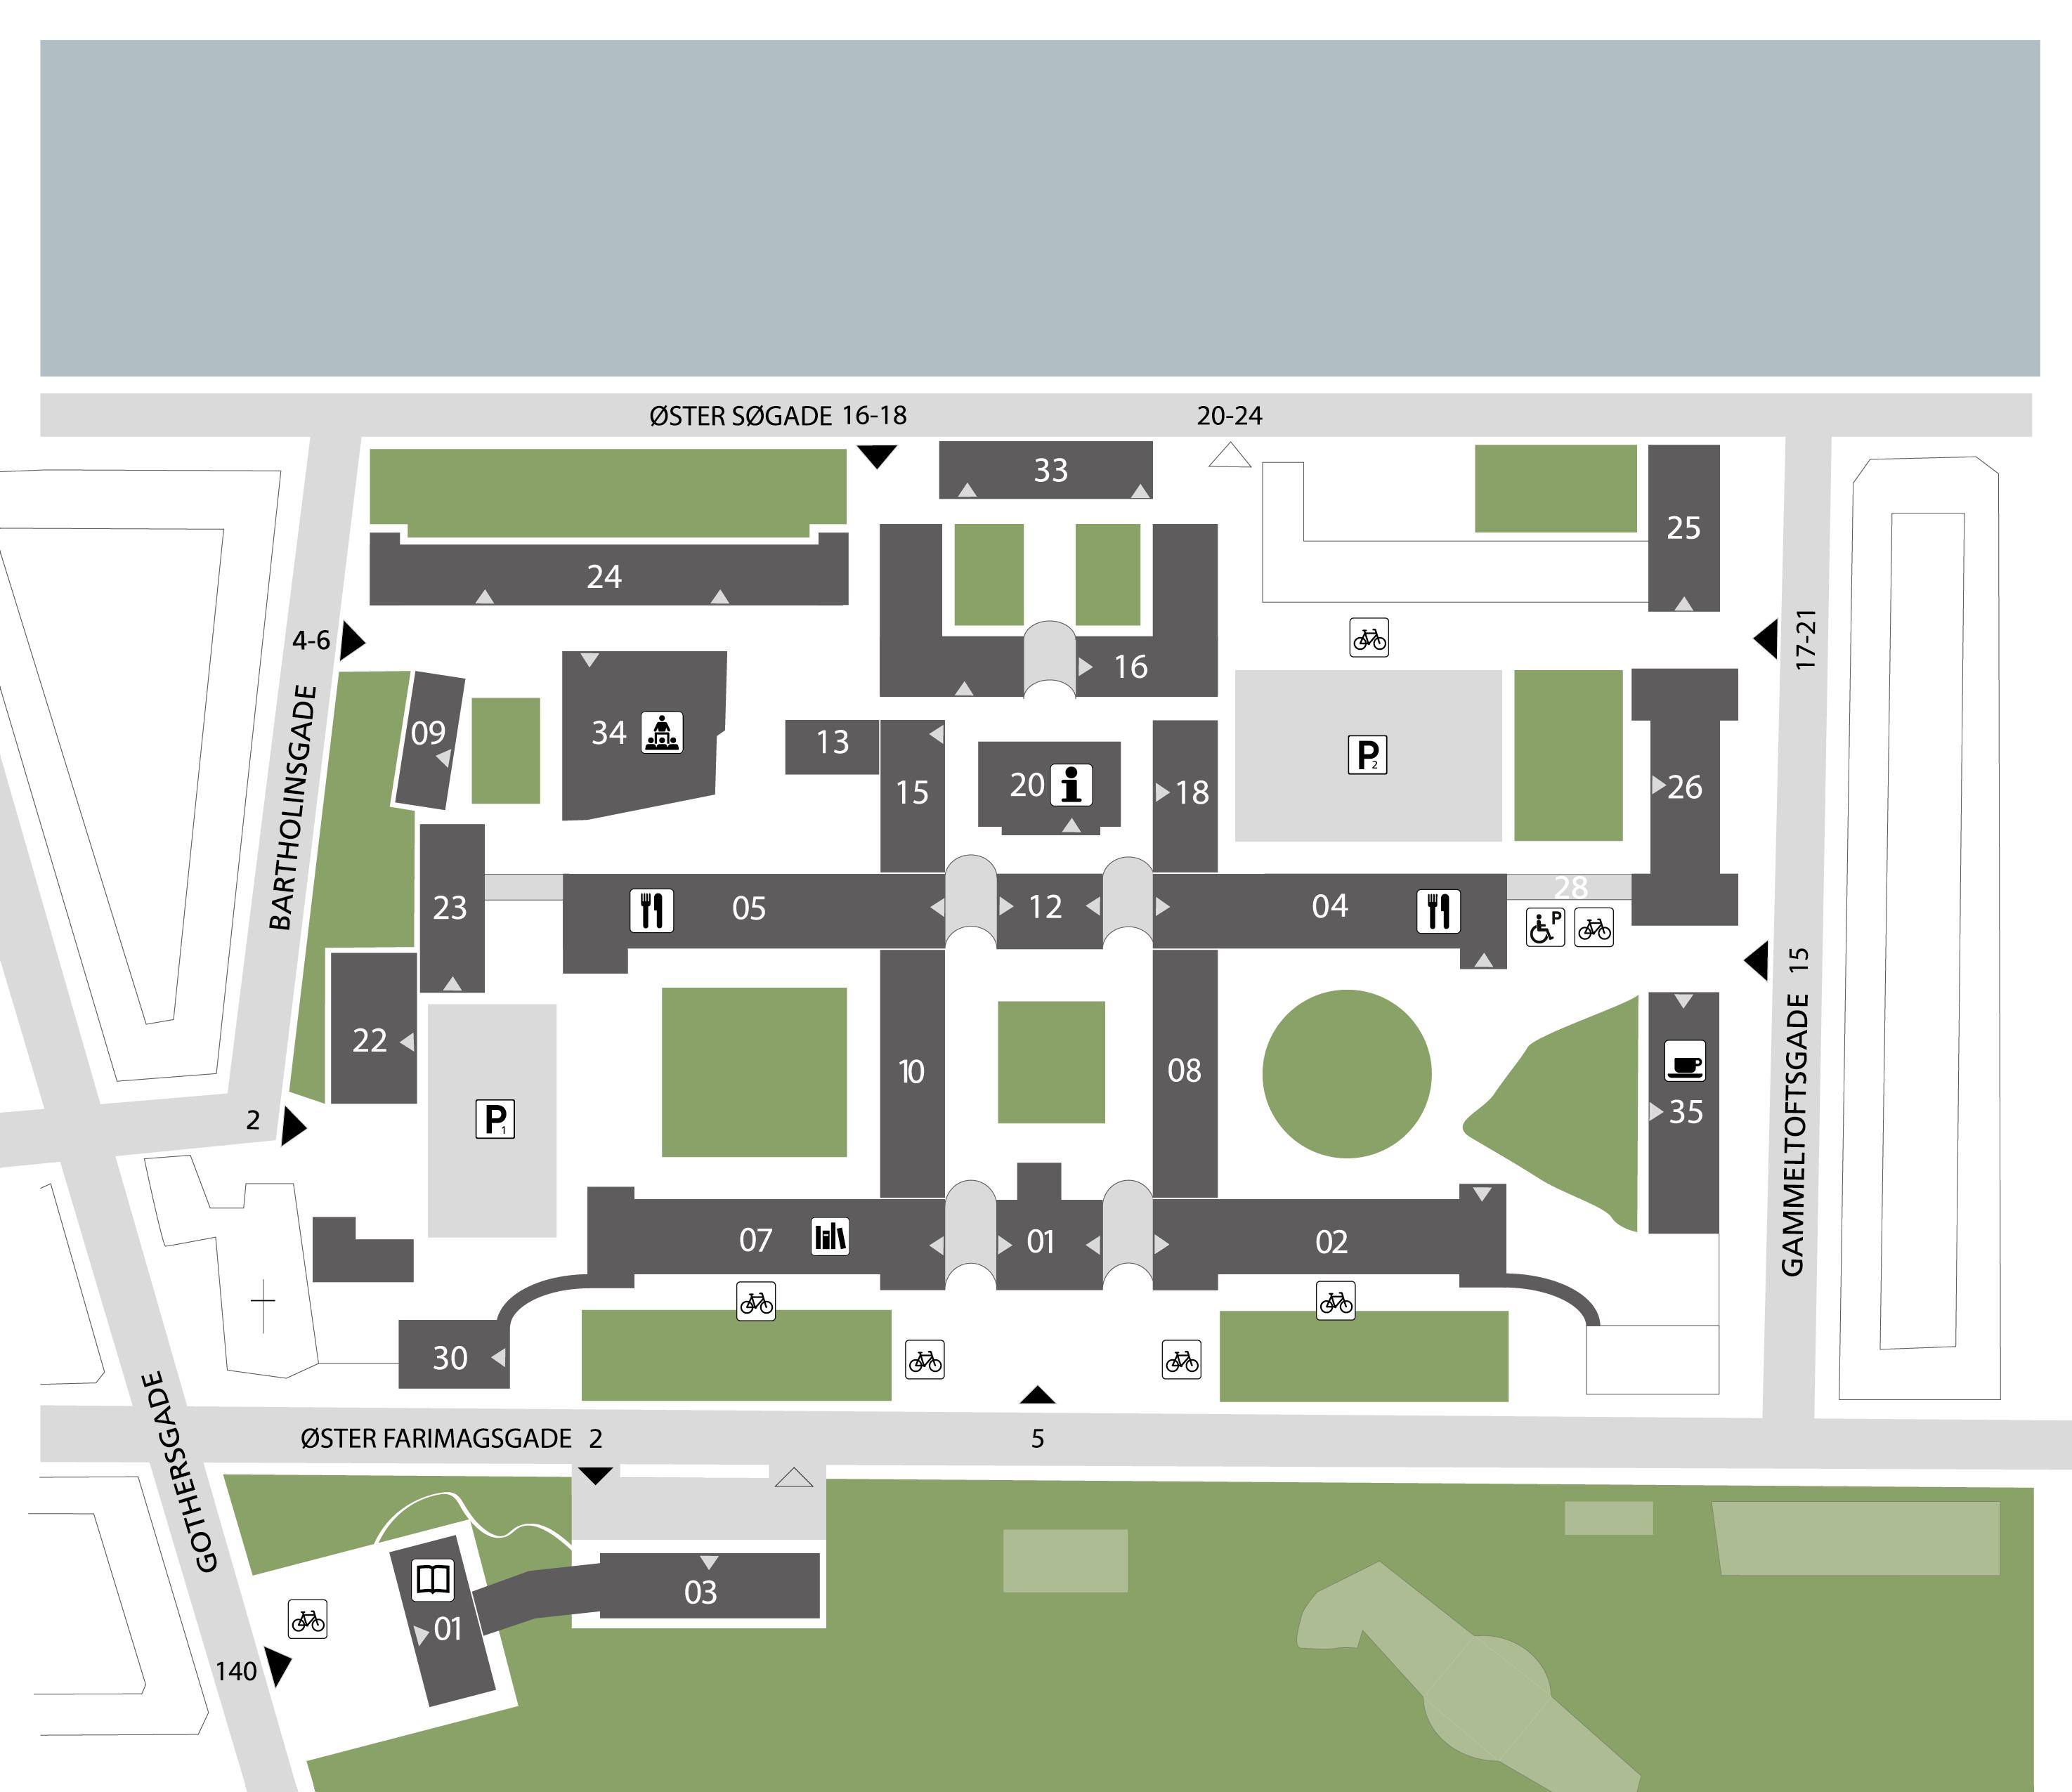 Kort over CSS Campus